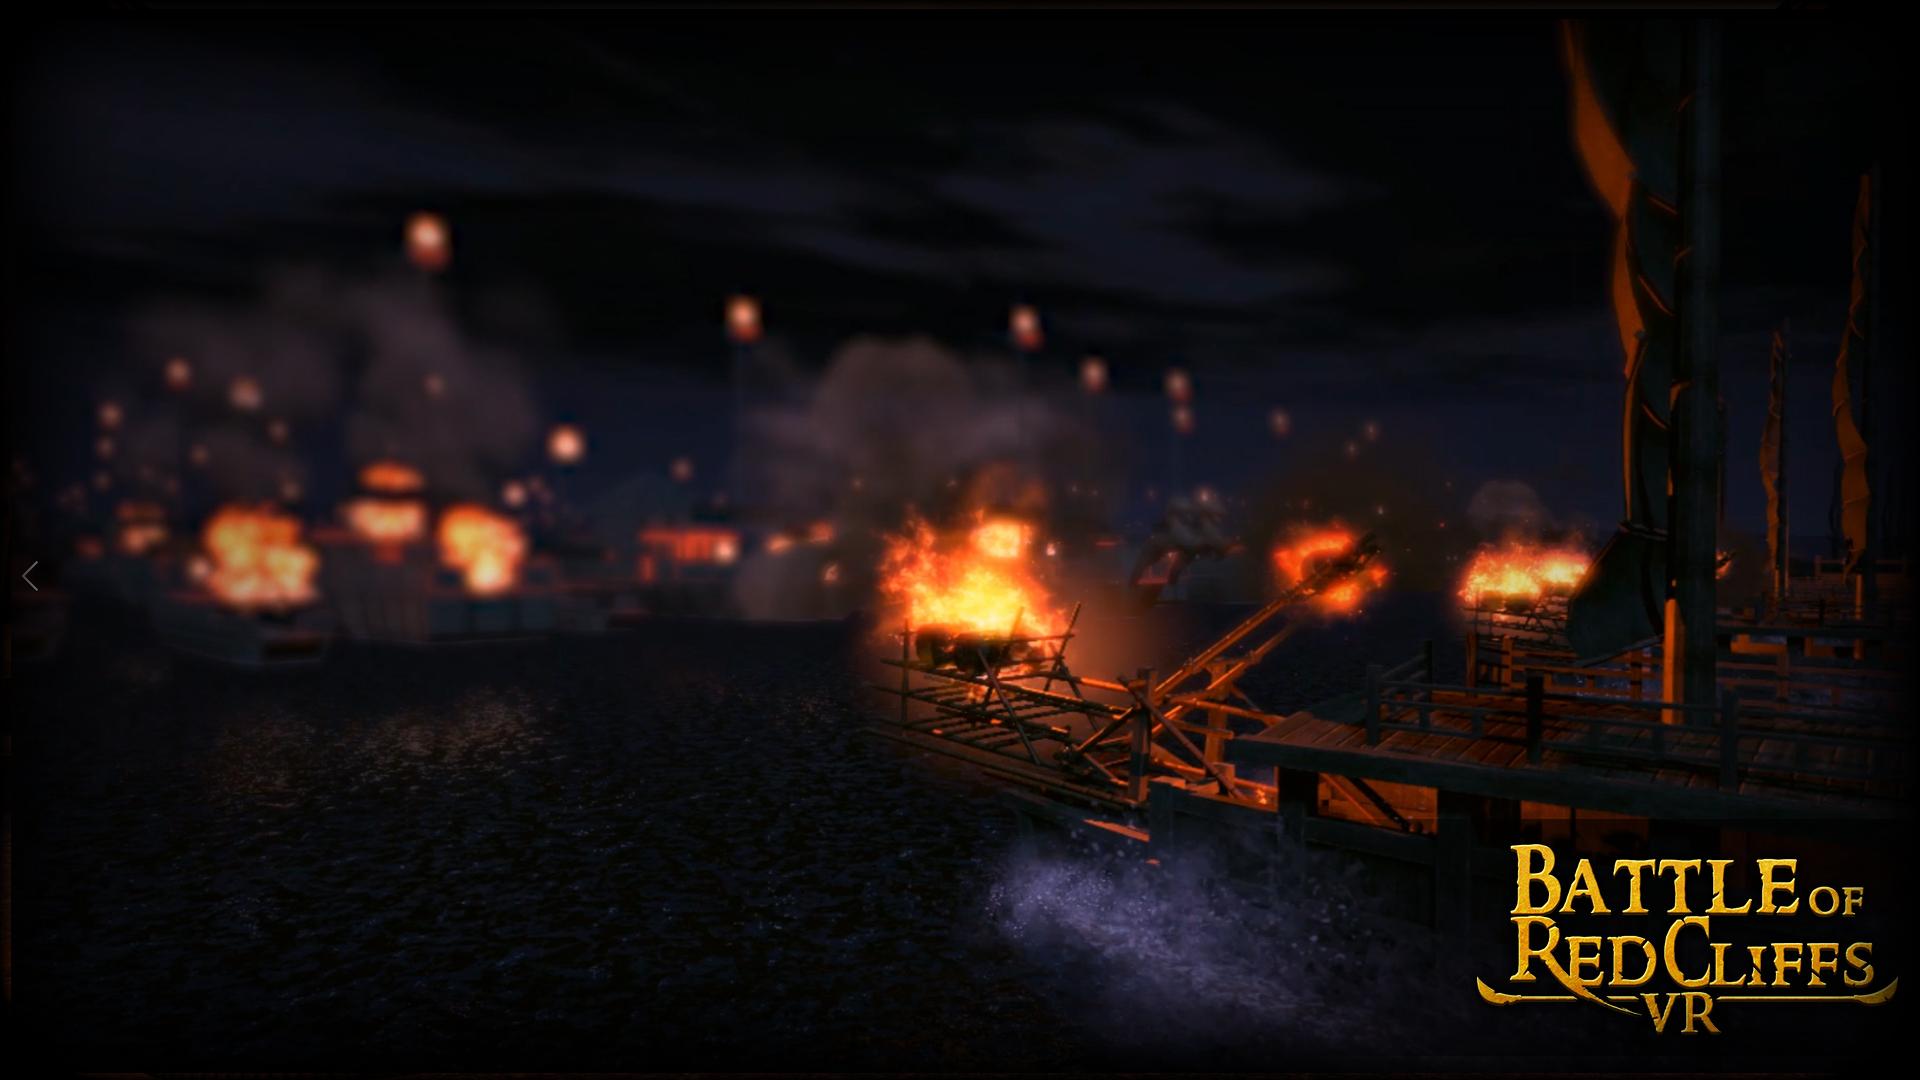 Battle At Red Cliffs